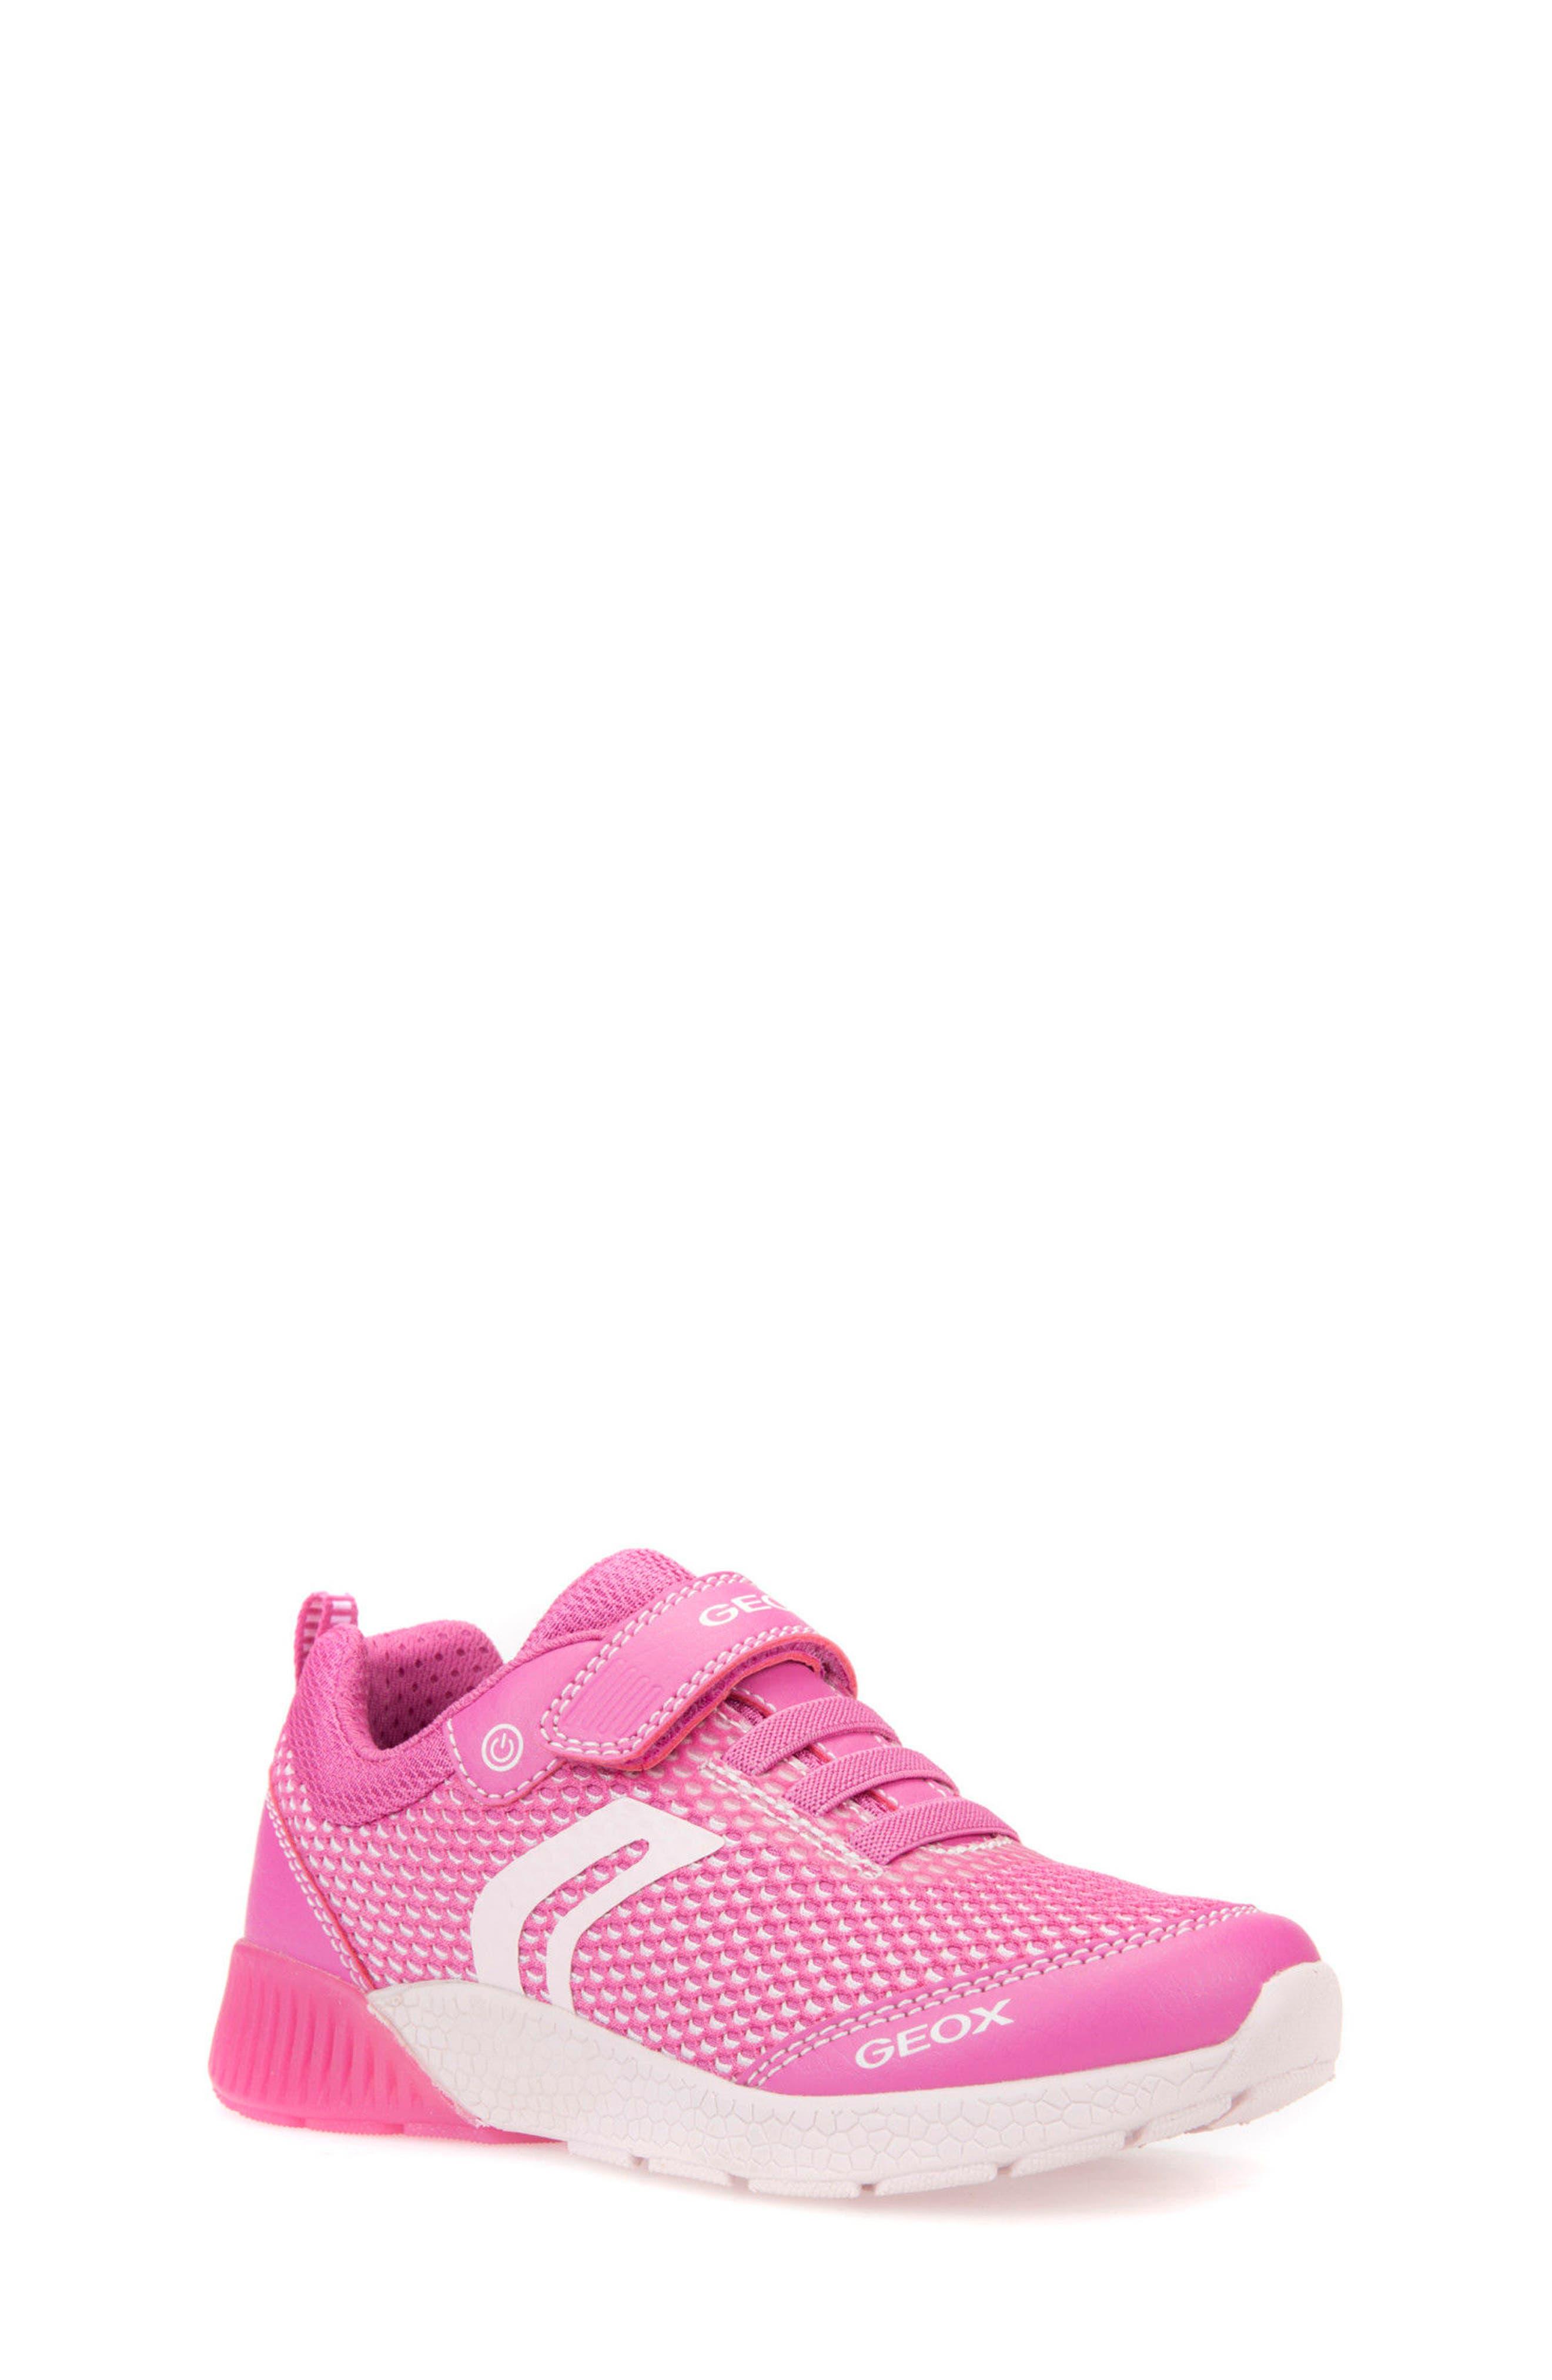 Sveth Light-Up Sneaker,                         Main,                         color, Fuchsia